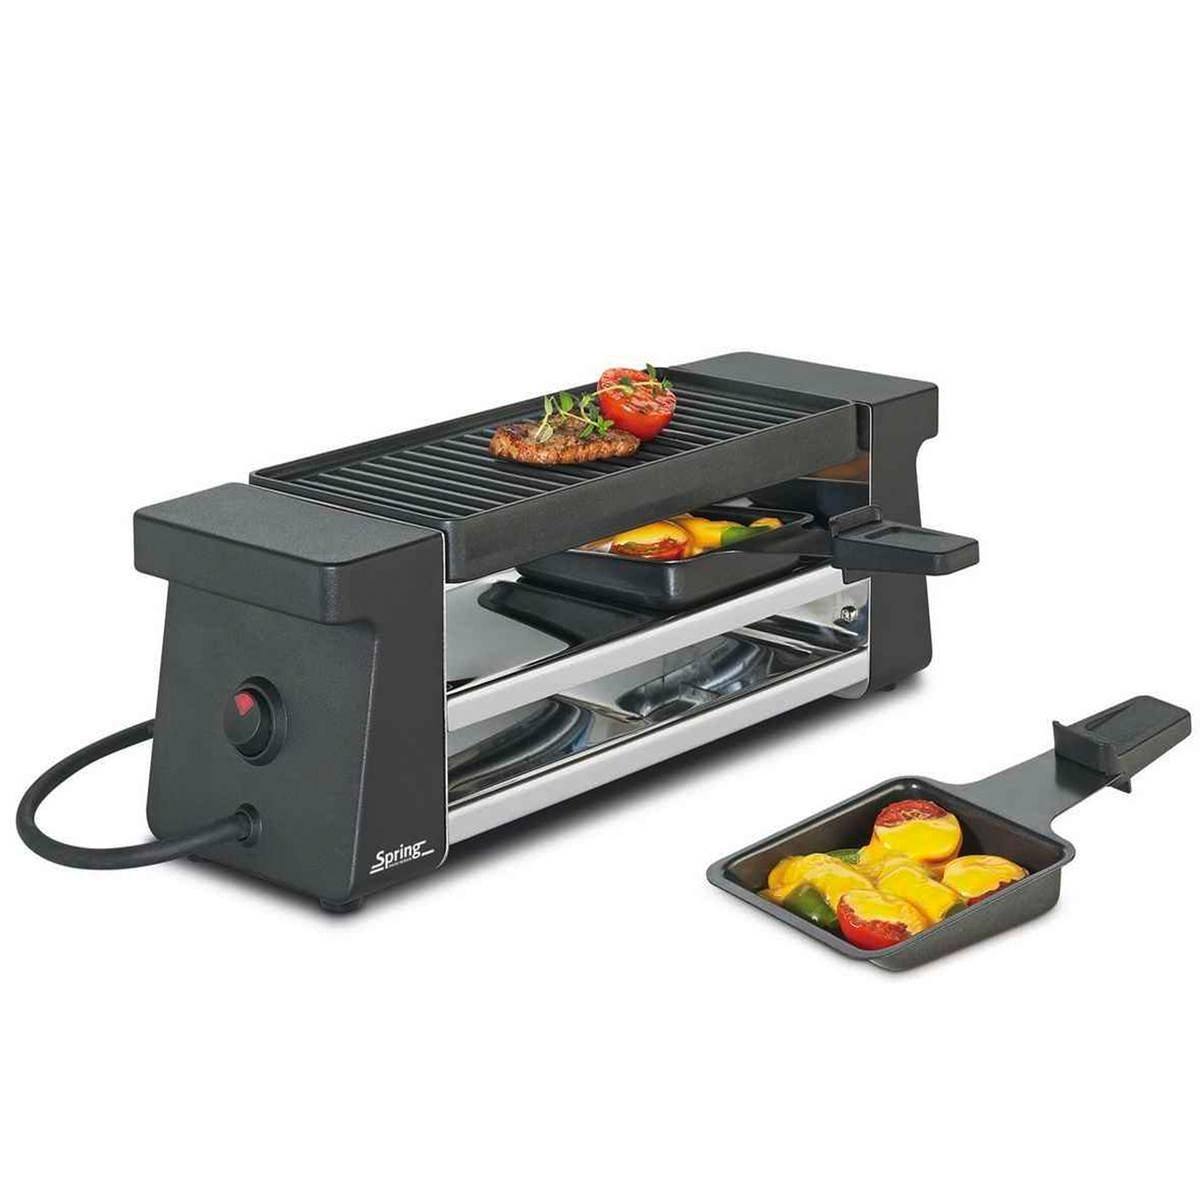 Spring - Set per raclette Compact, colore: Nero 30 3700 70 01